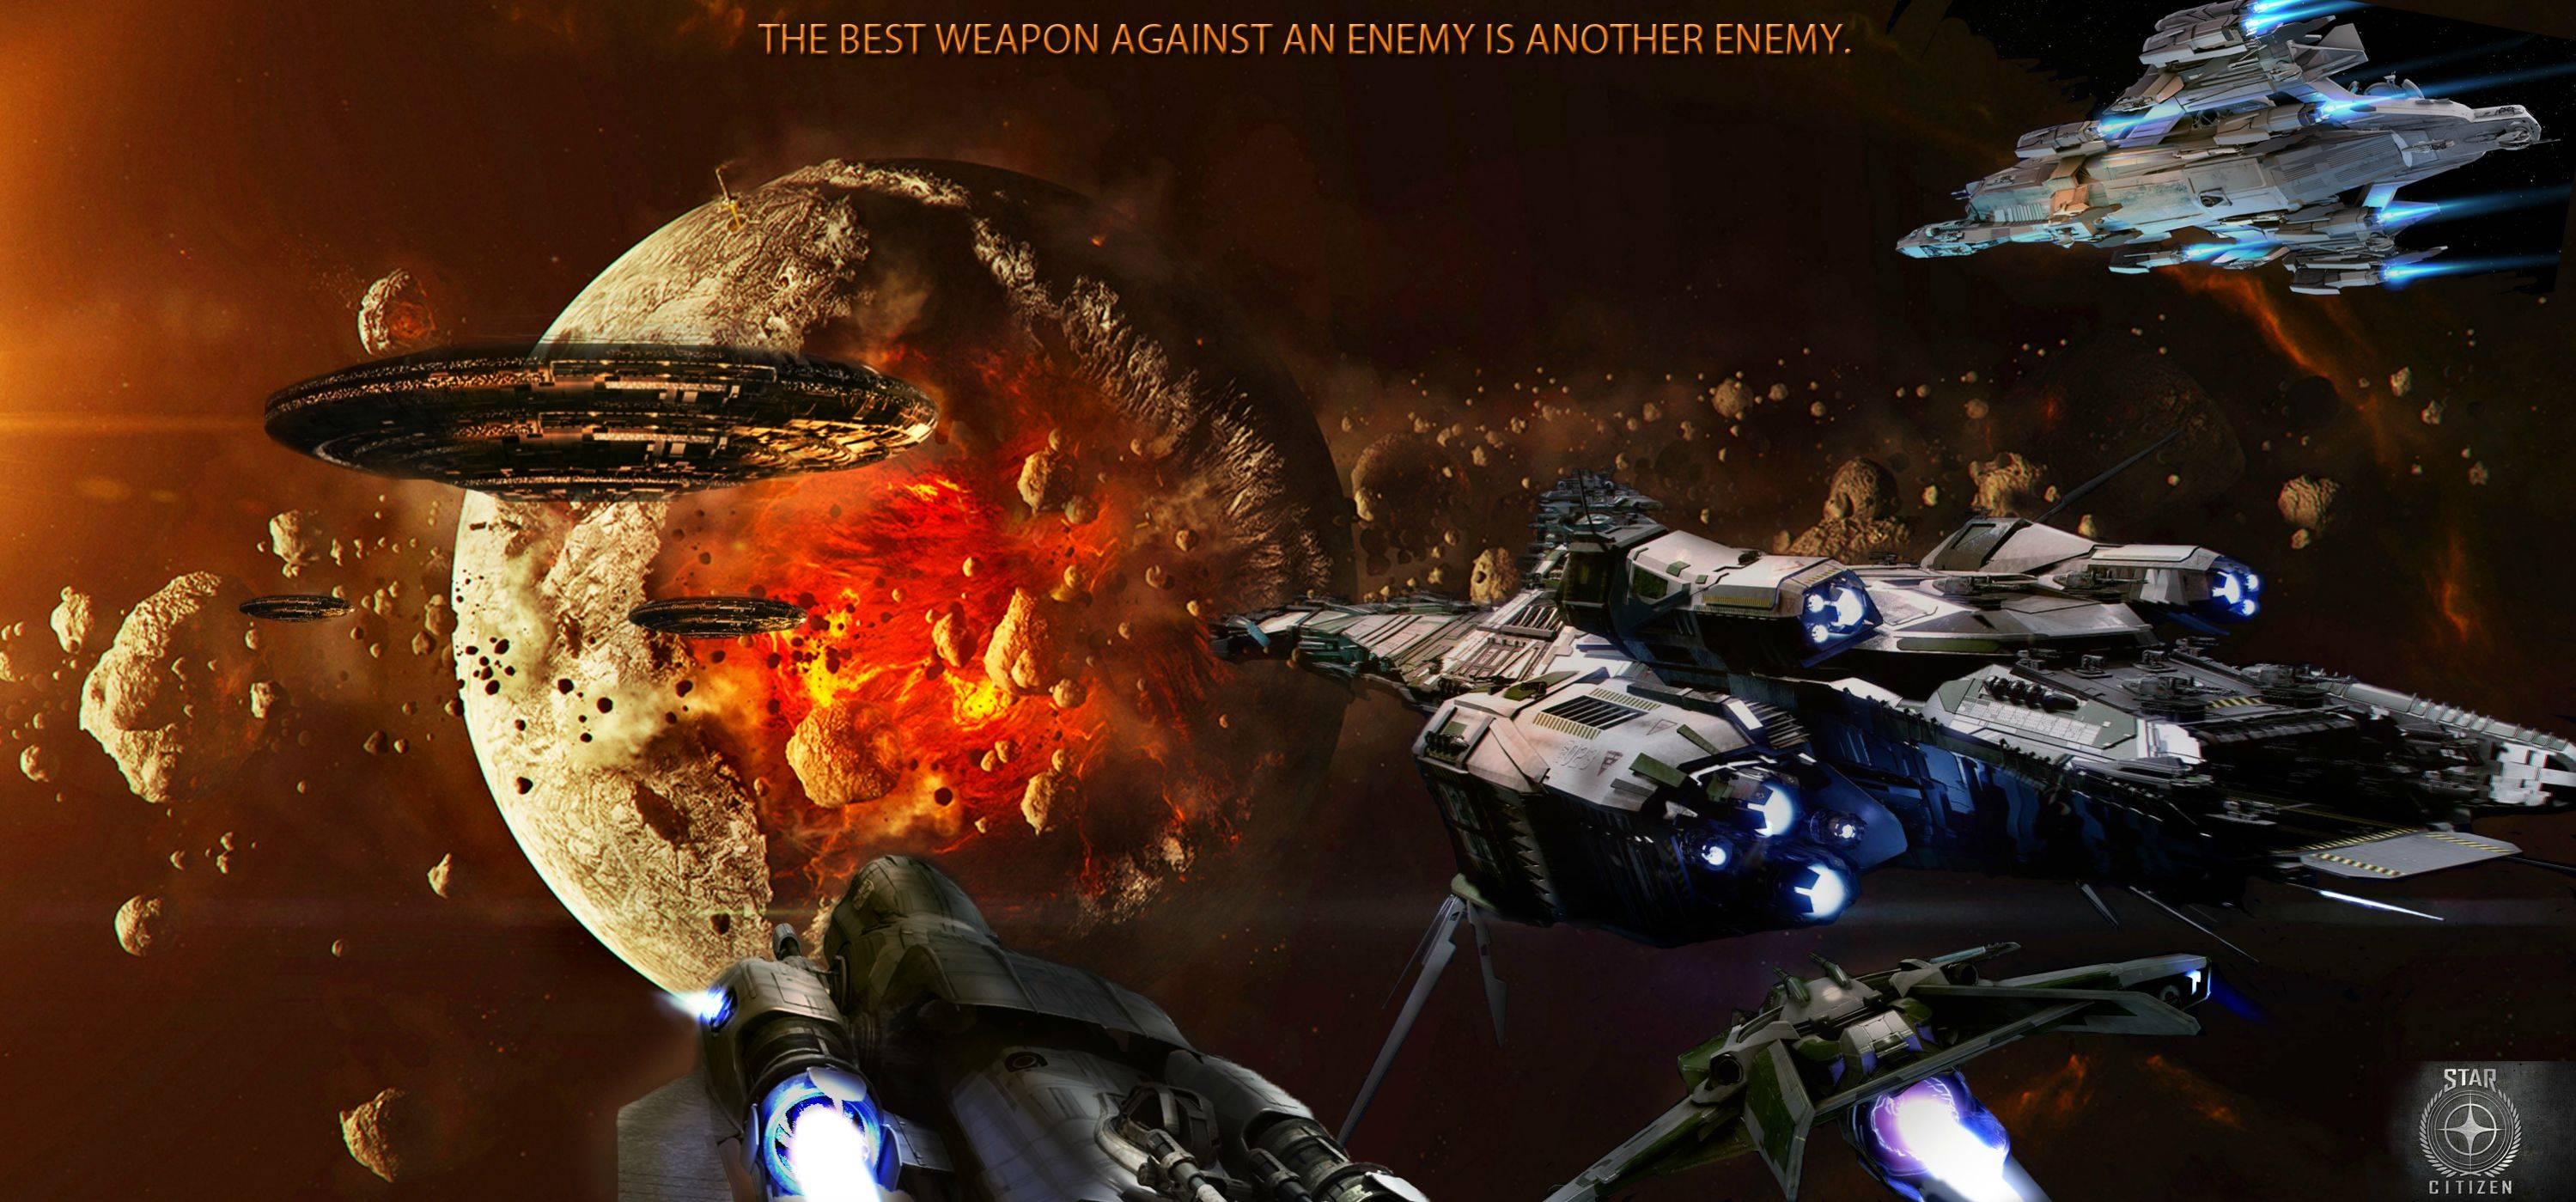 STAR CITIZEN sci fi spaceship game space battle h wallpaper background 2999x1399